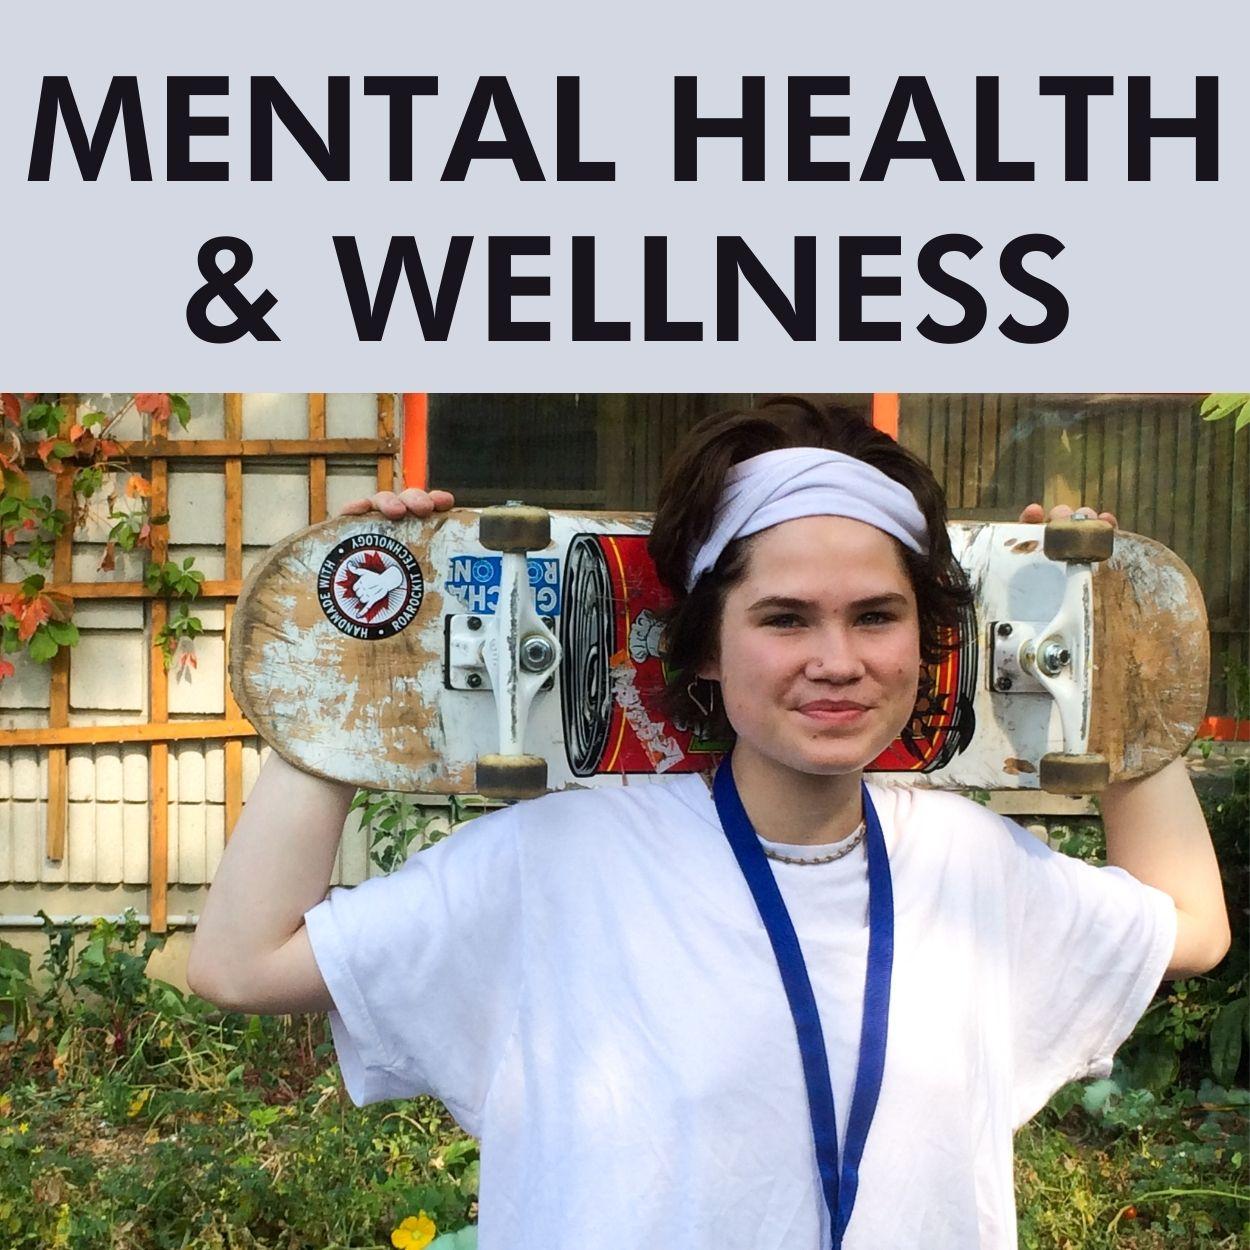 MENTAL HEALTH & WELLNESS (2)